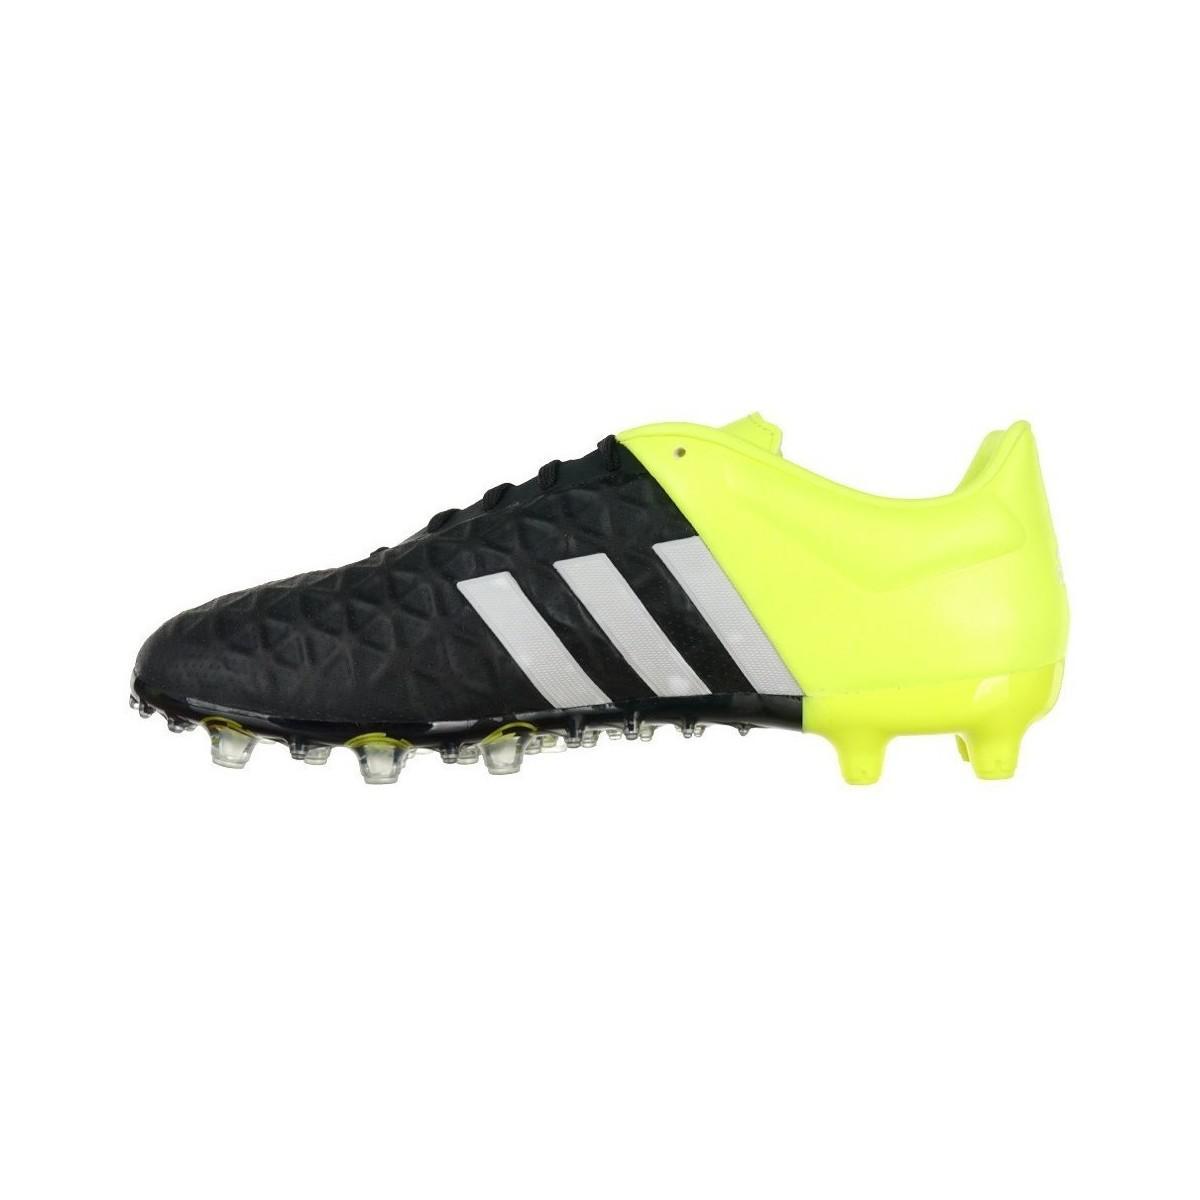 adidas. Ace 152 Fgag Men's Football Boots ...